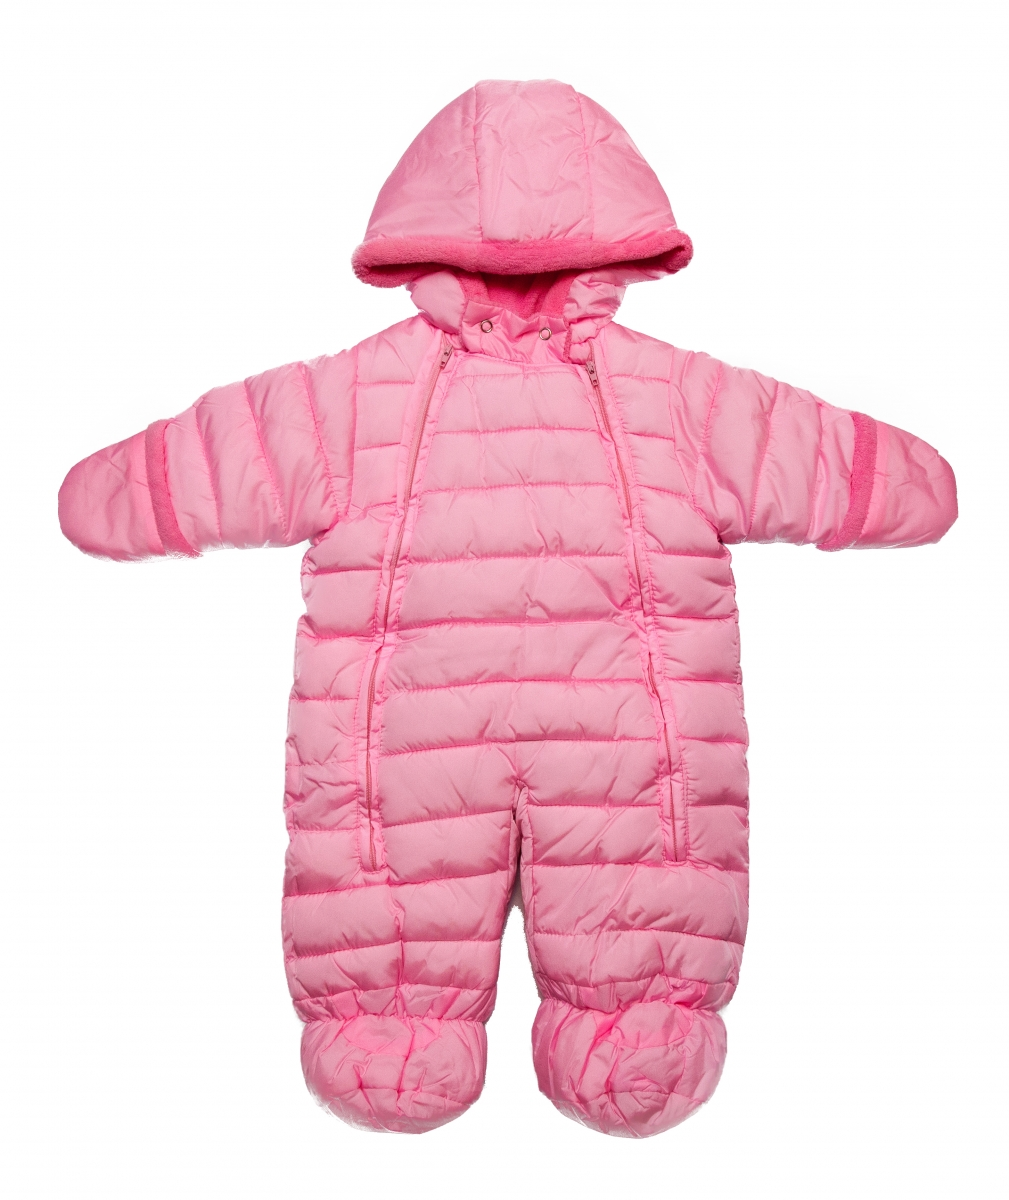 Combinezoane bebe copii de iarna 3551 fuxia roz 3luni-12luni